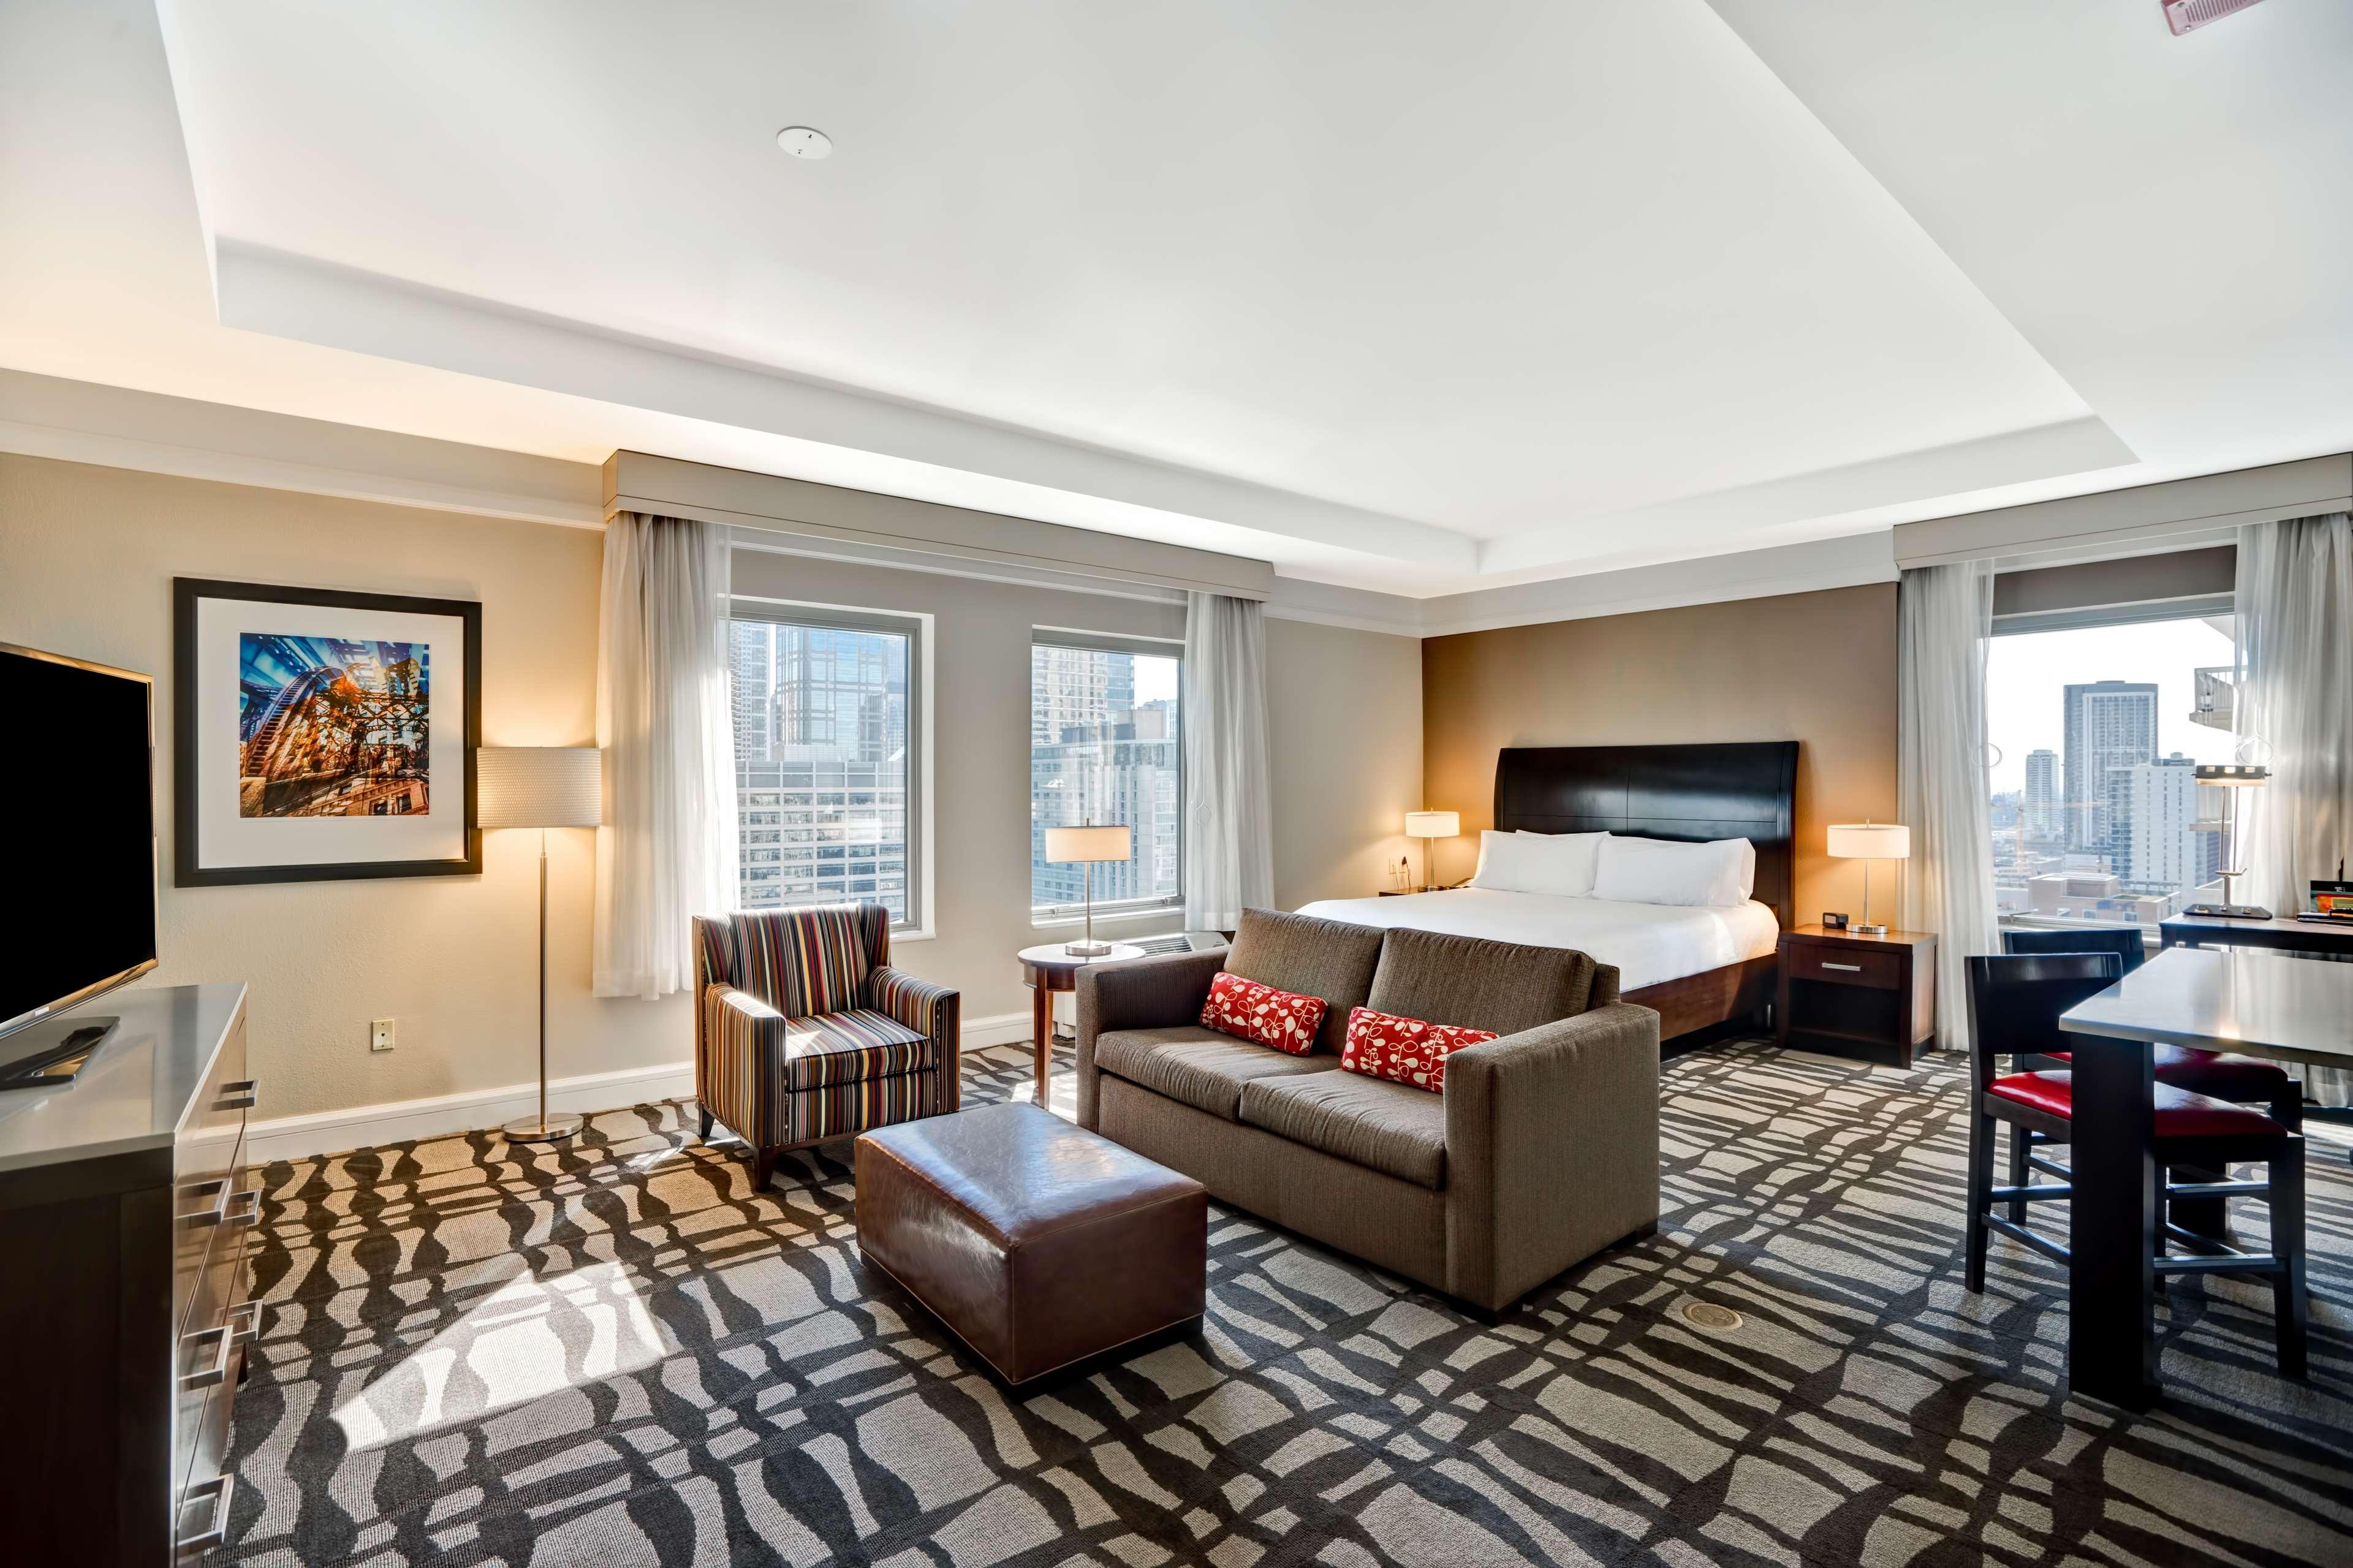 Hilton Garden Inn Chicago Downtown/Magnificent Mile image 24